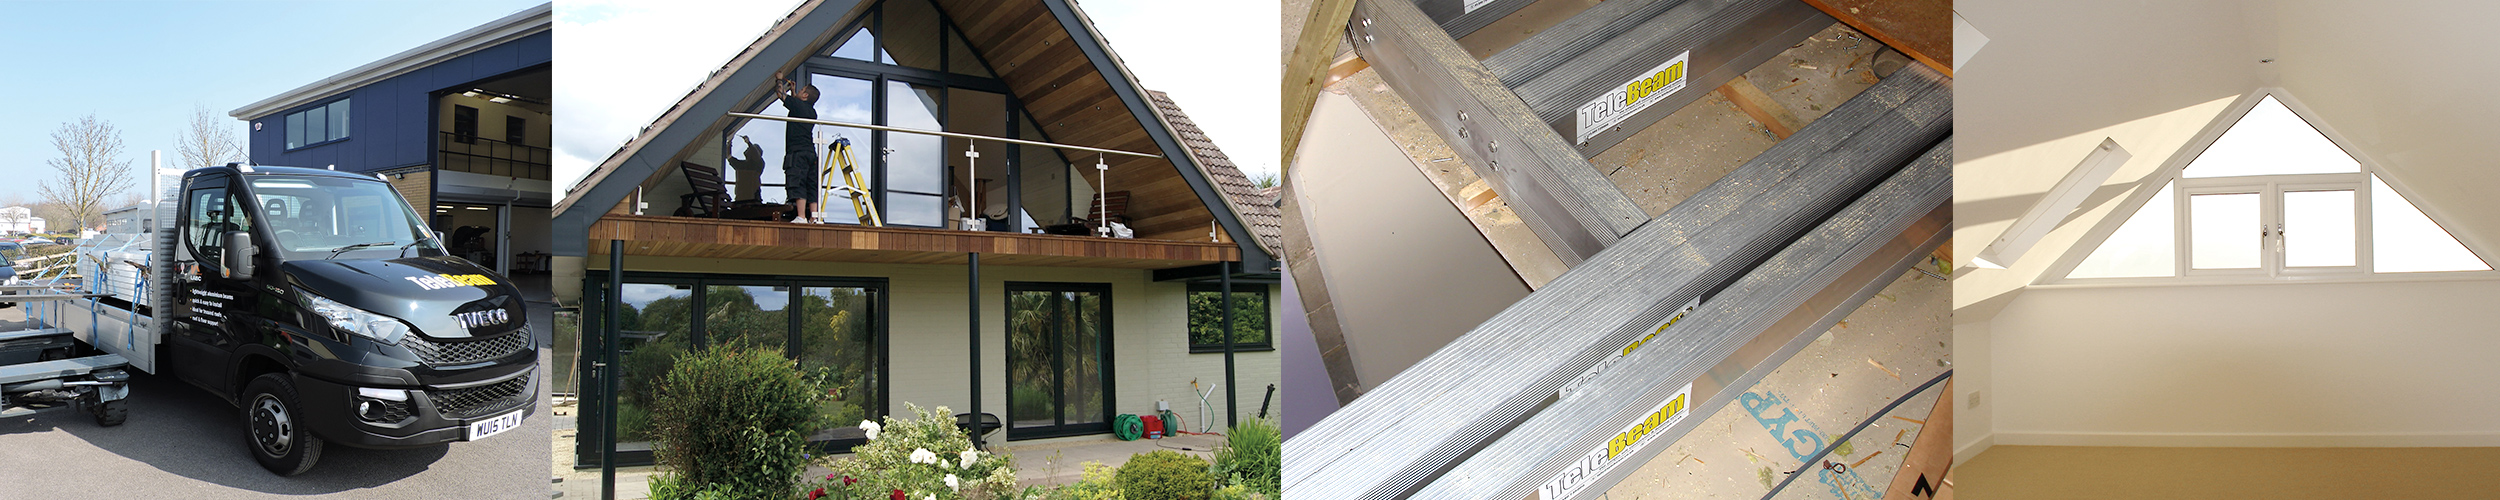 Loft conversion in progress